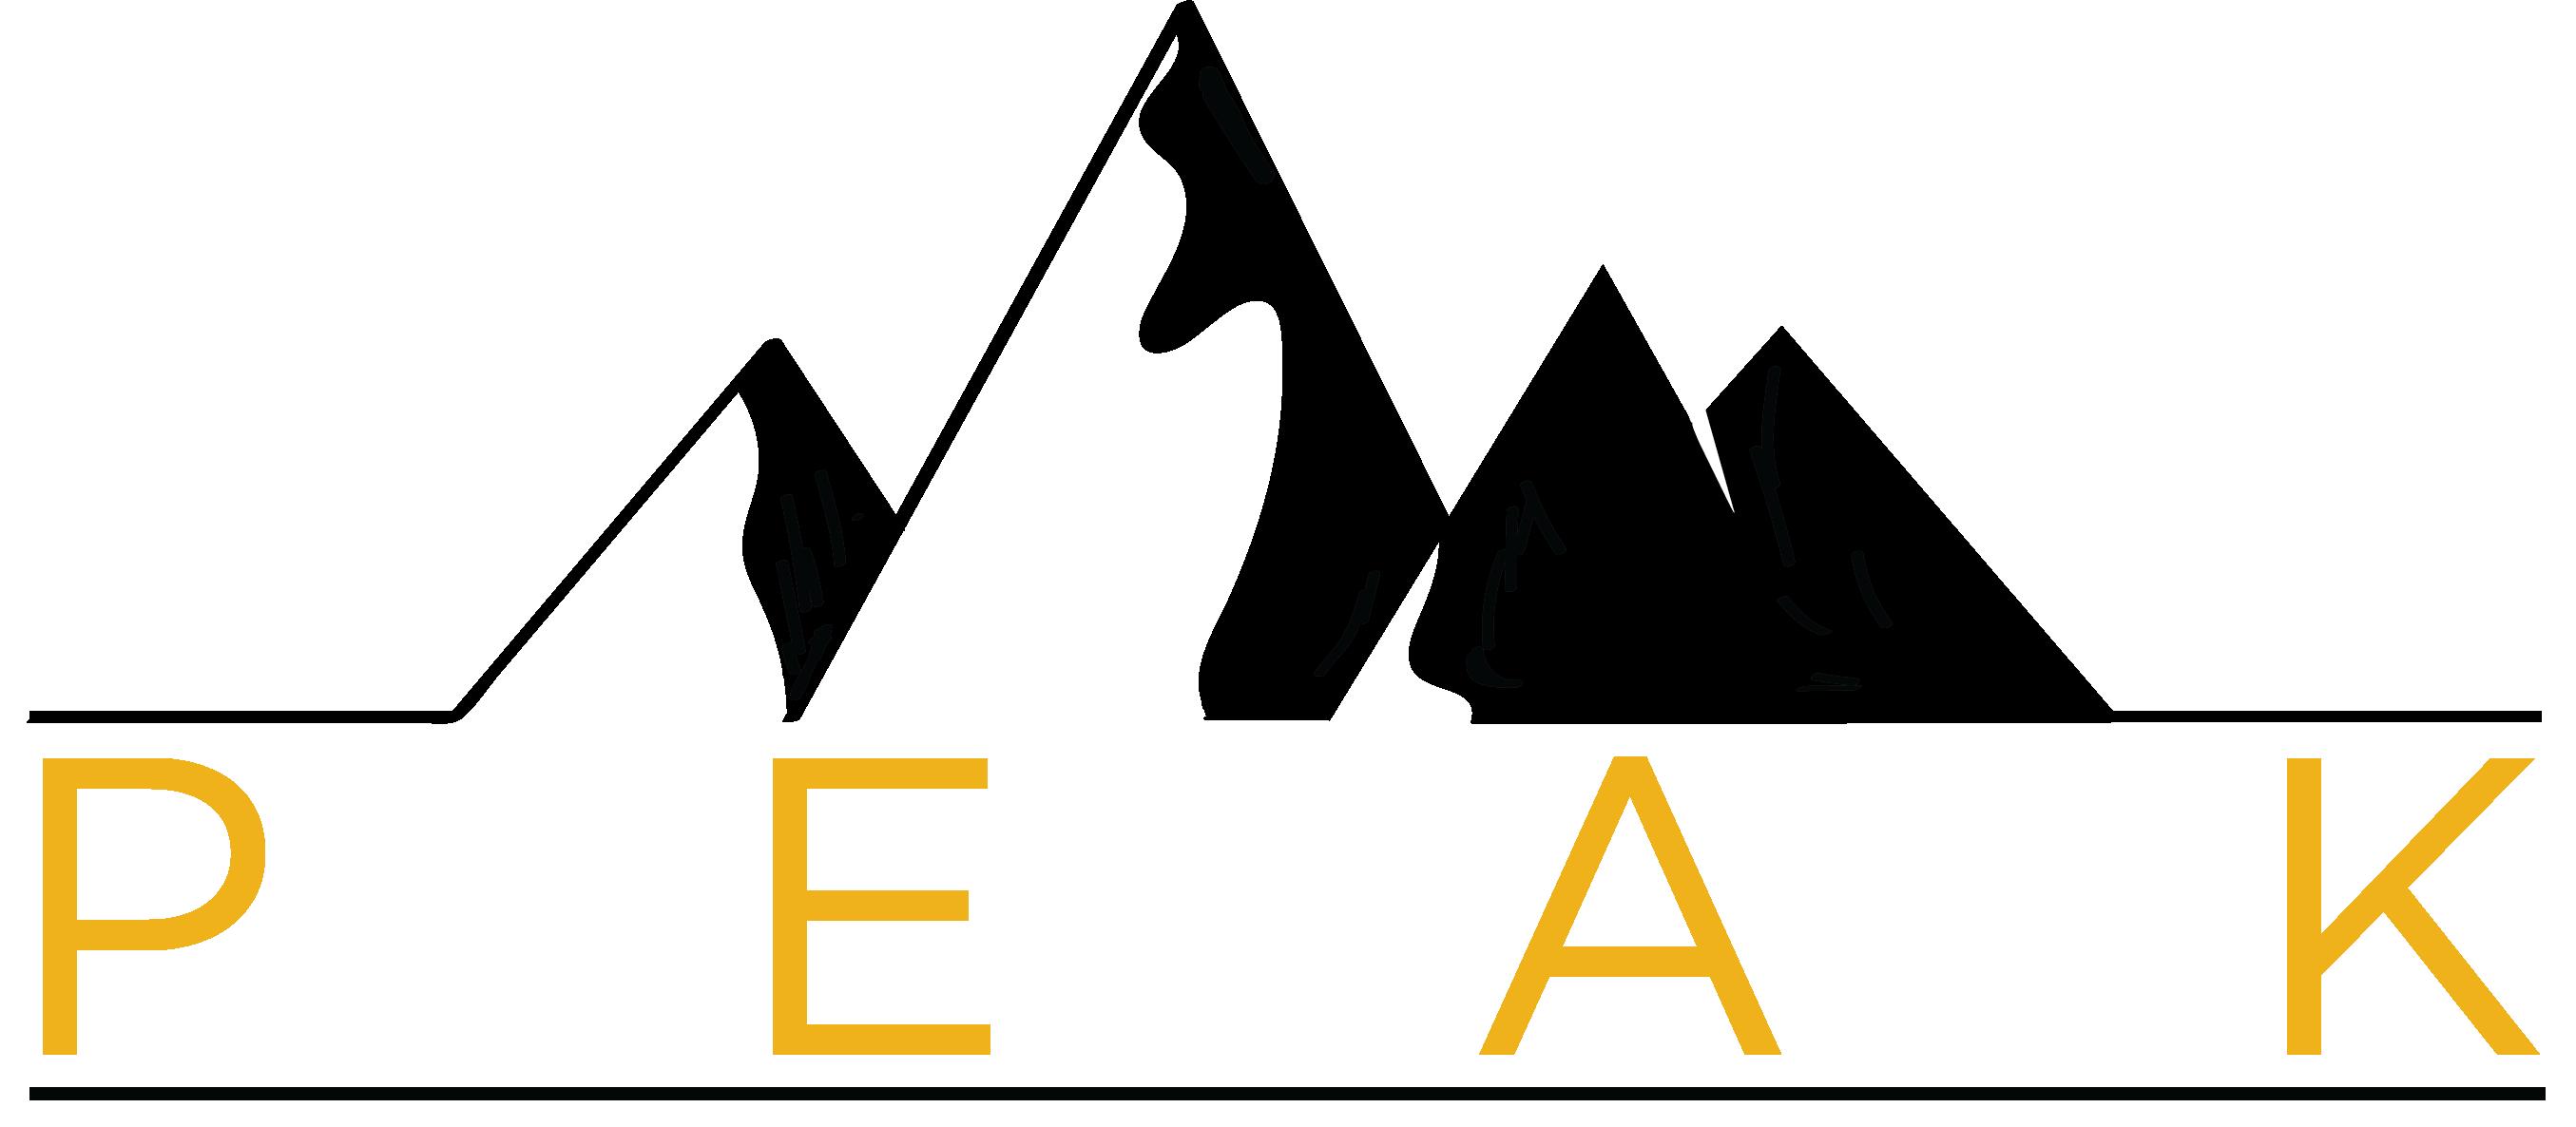 Peak_Logo.png